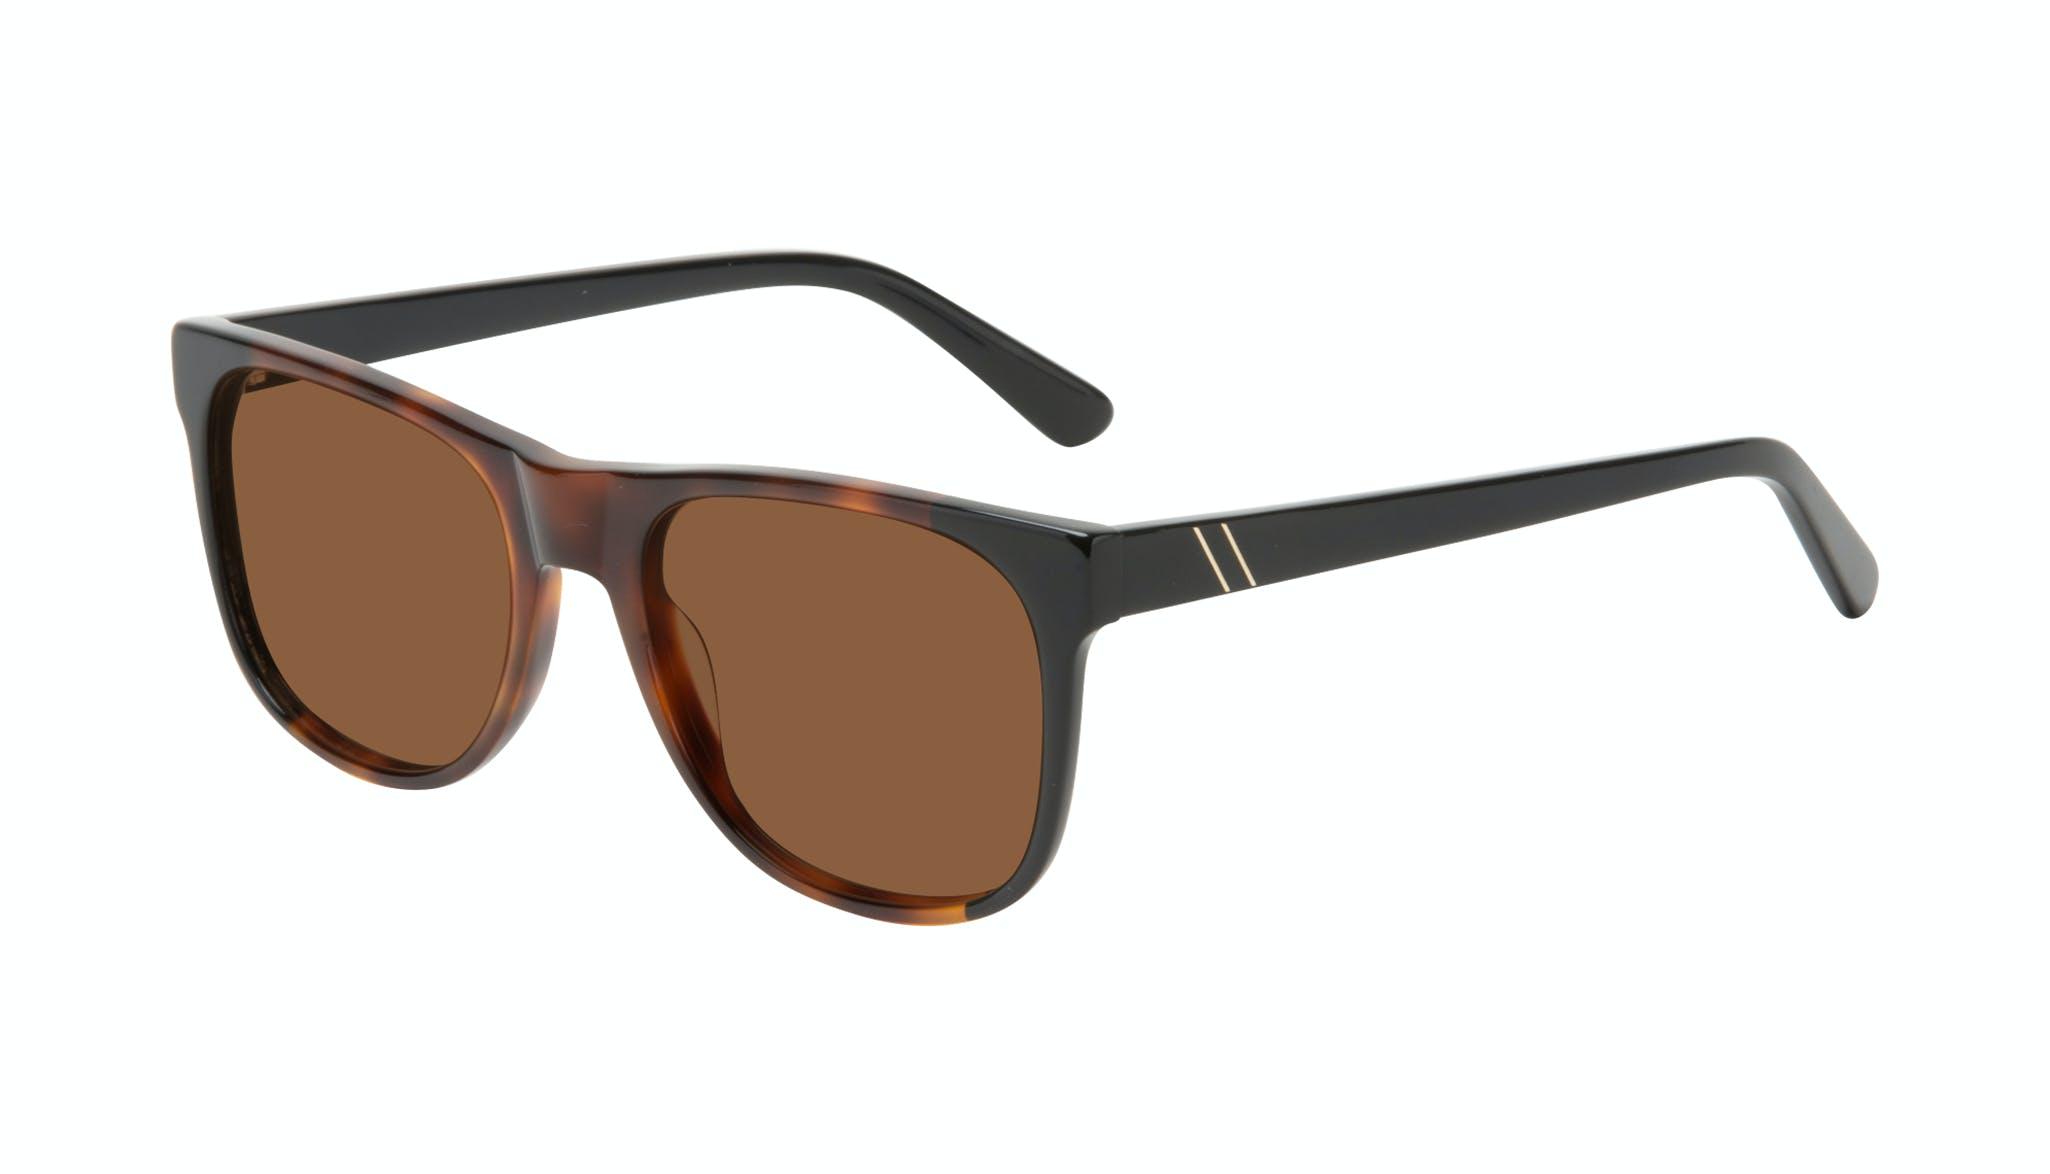 Affordable Fashion Glasses Square Sunglasses Men Make Black Tort Tilt